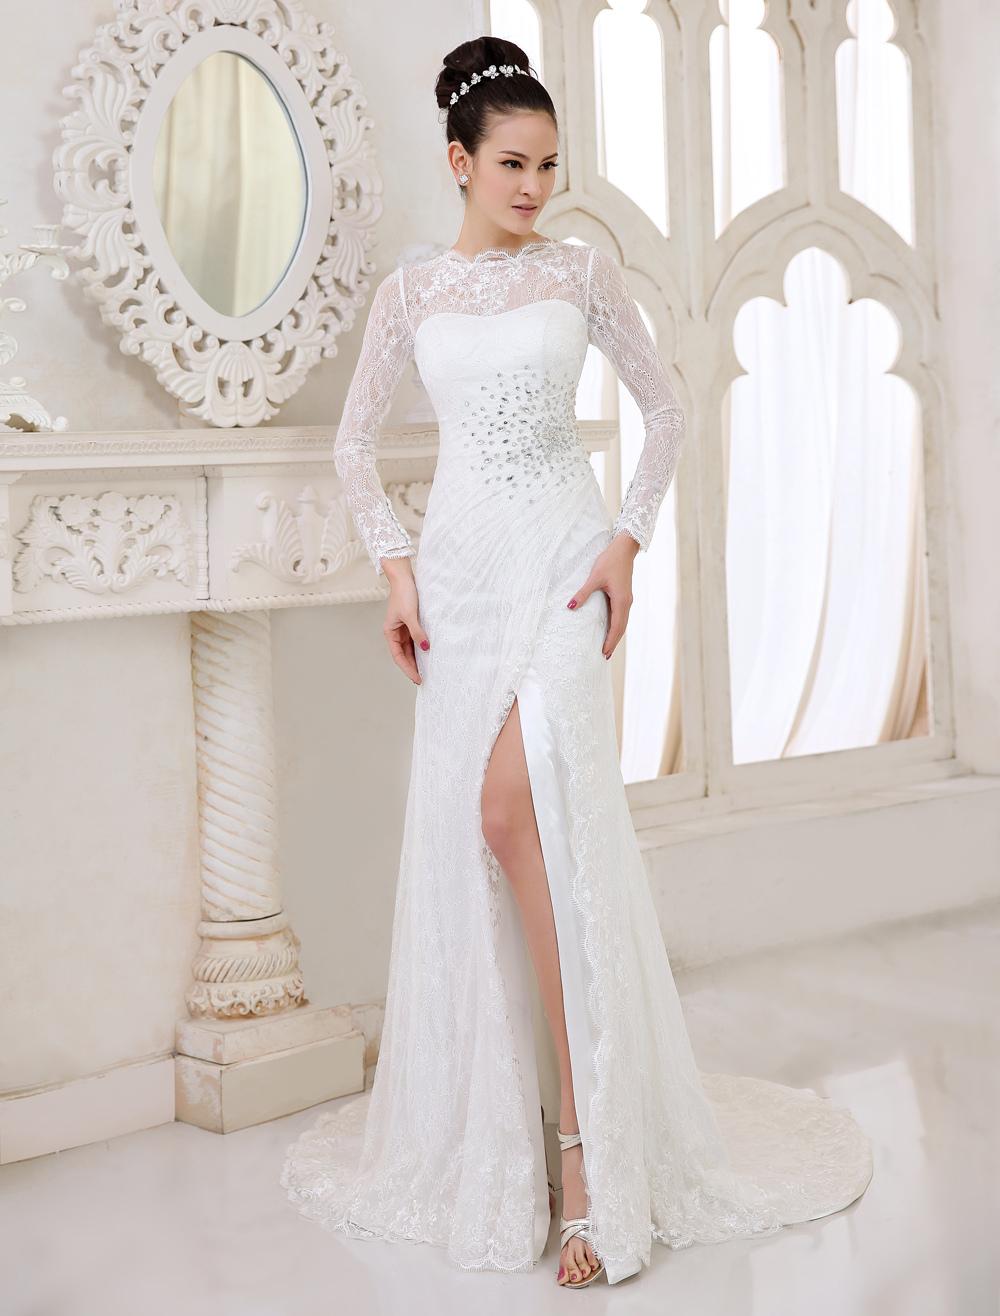 Robe de mariée avec fente devant - Milanoo.com